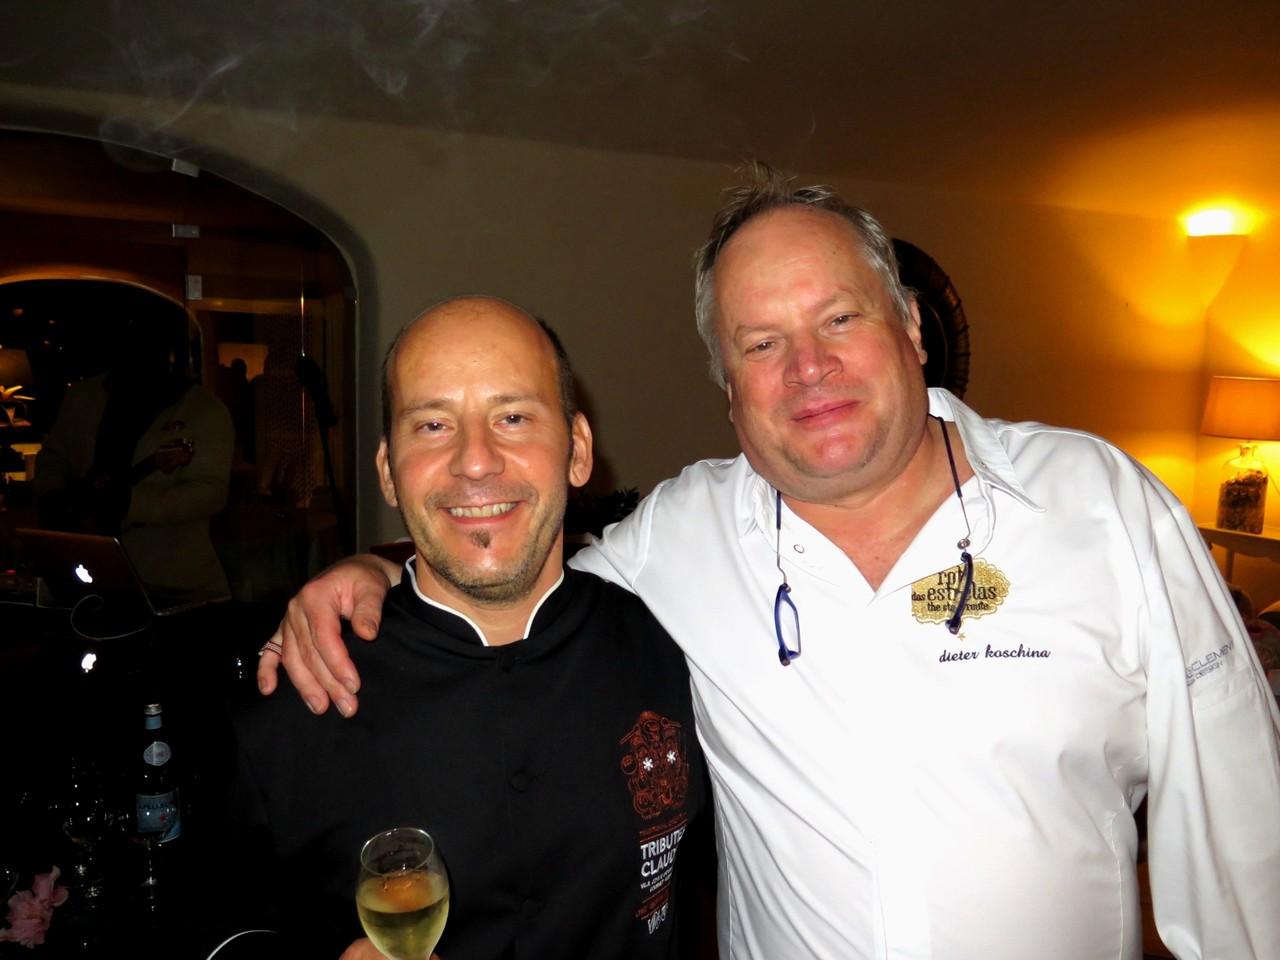 Bernhard Posch & Dieter Koschina